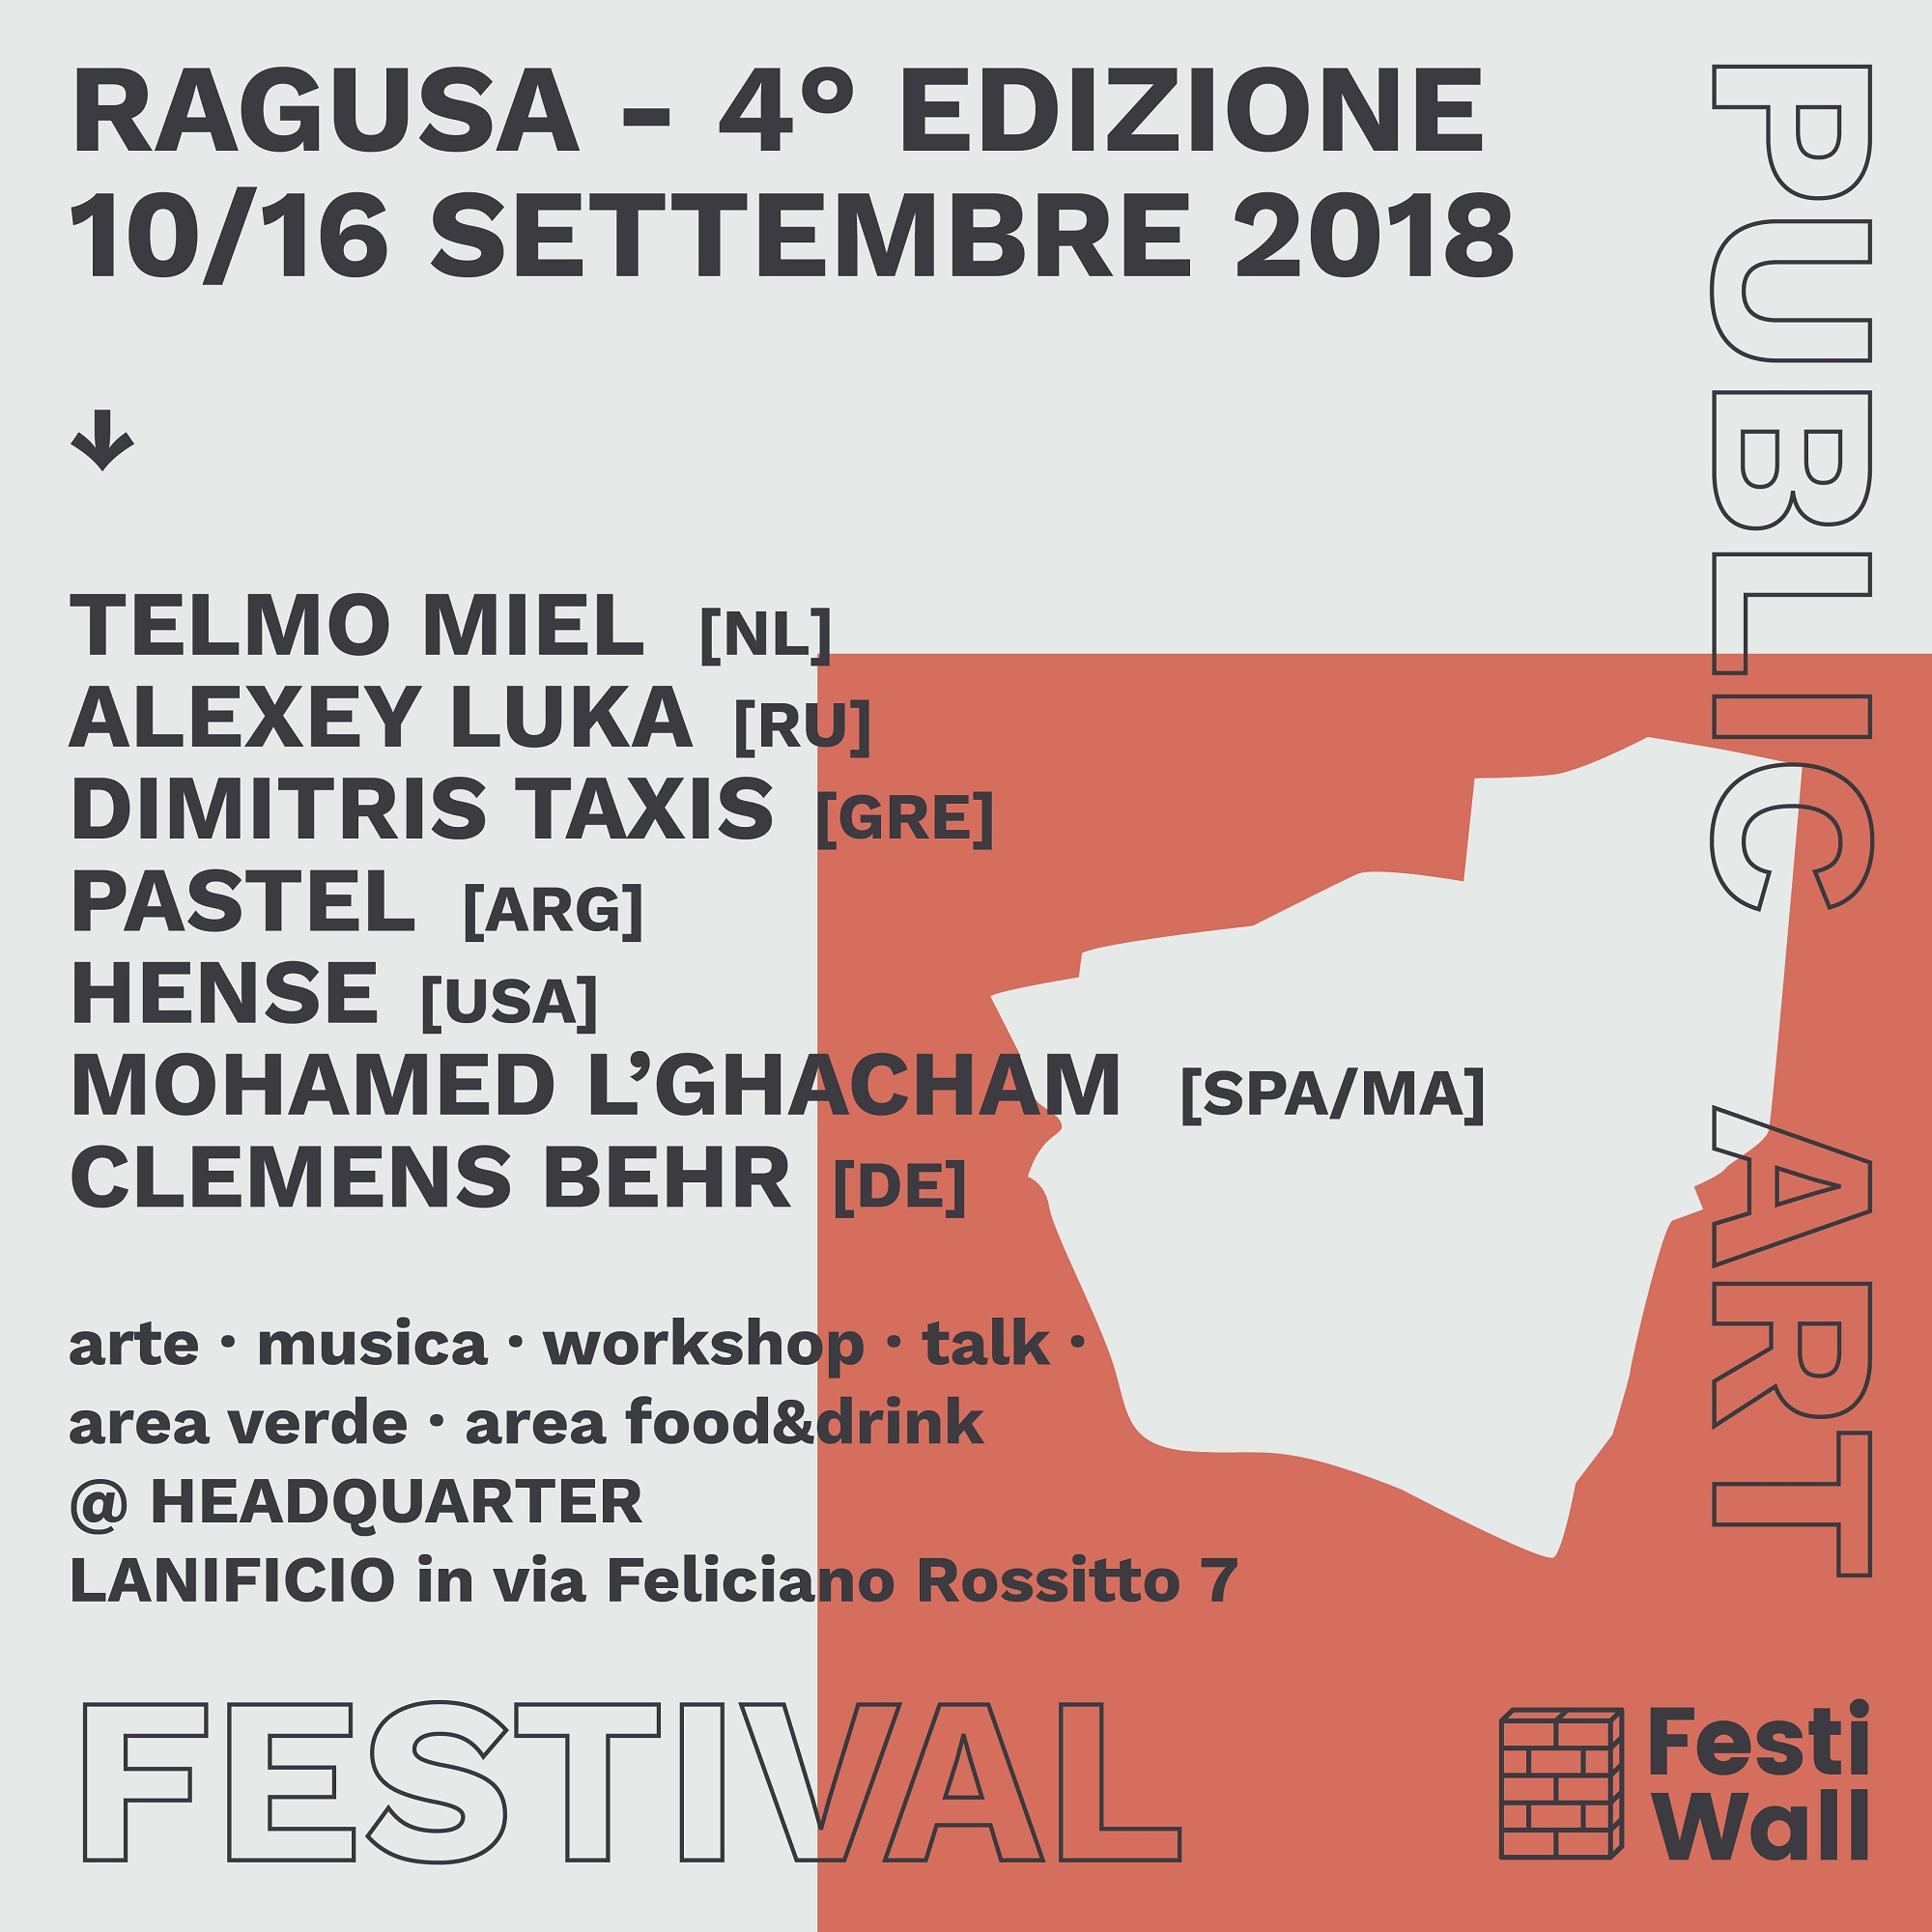 Ragusa FestiWall 2018 - Public Art Festival 2018